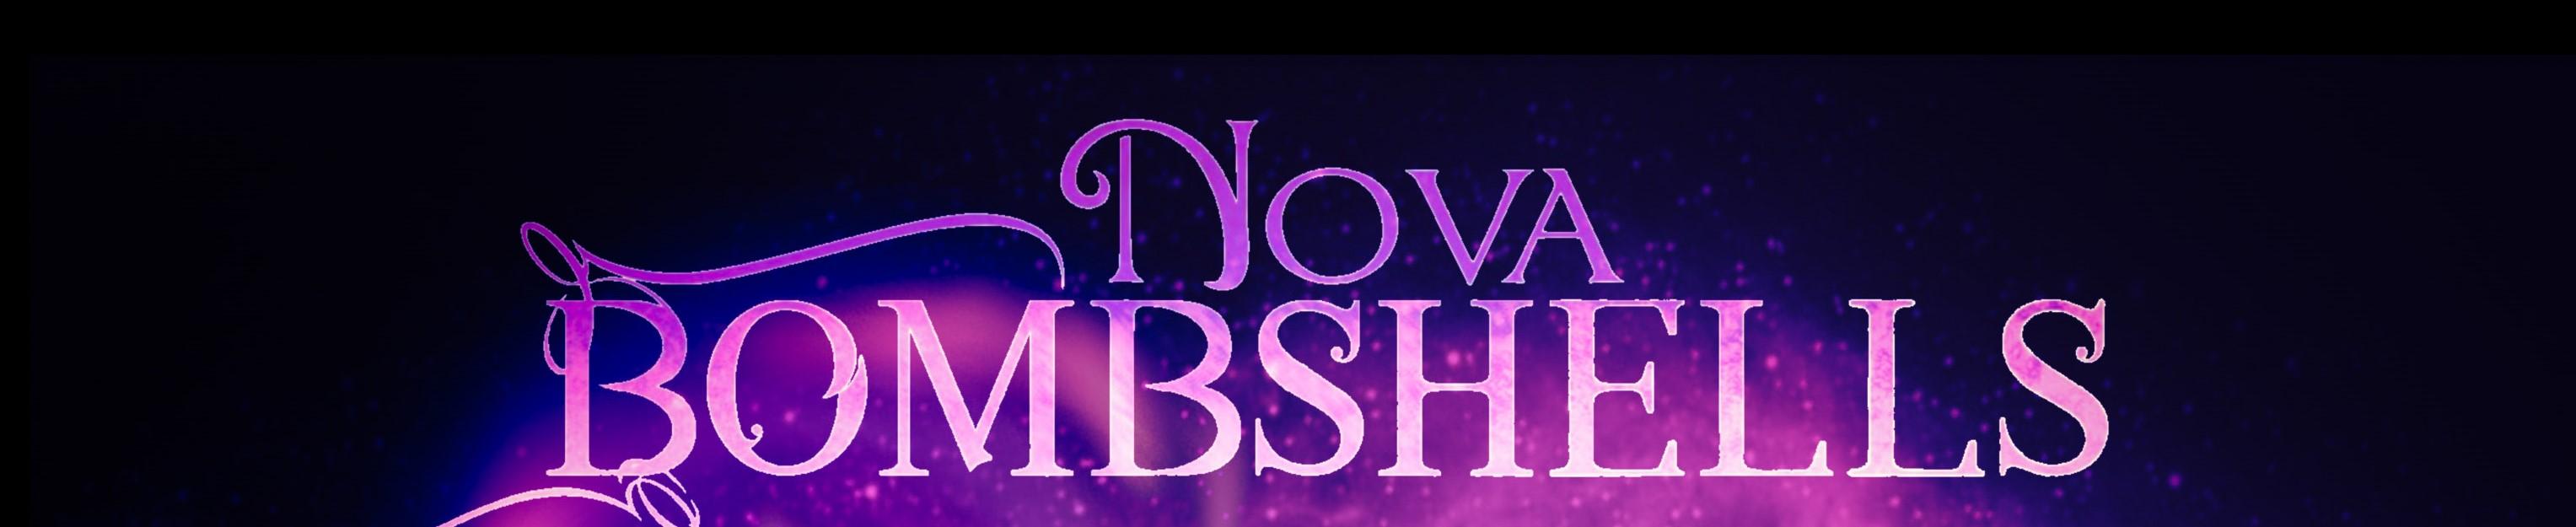 Nova bombshells  4